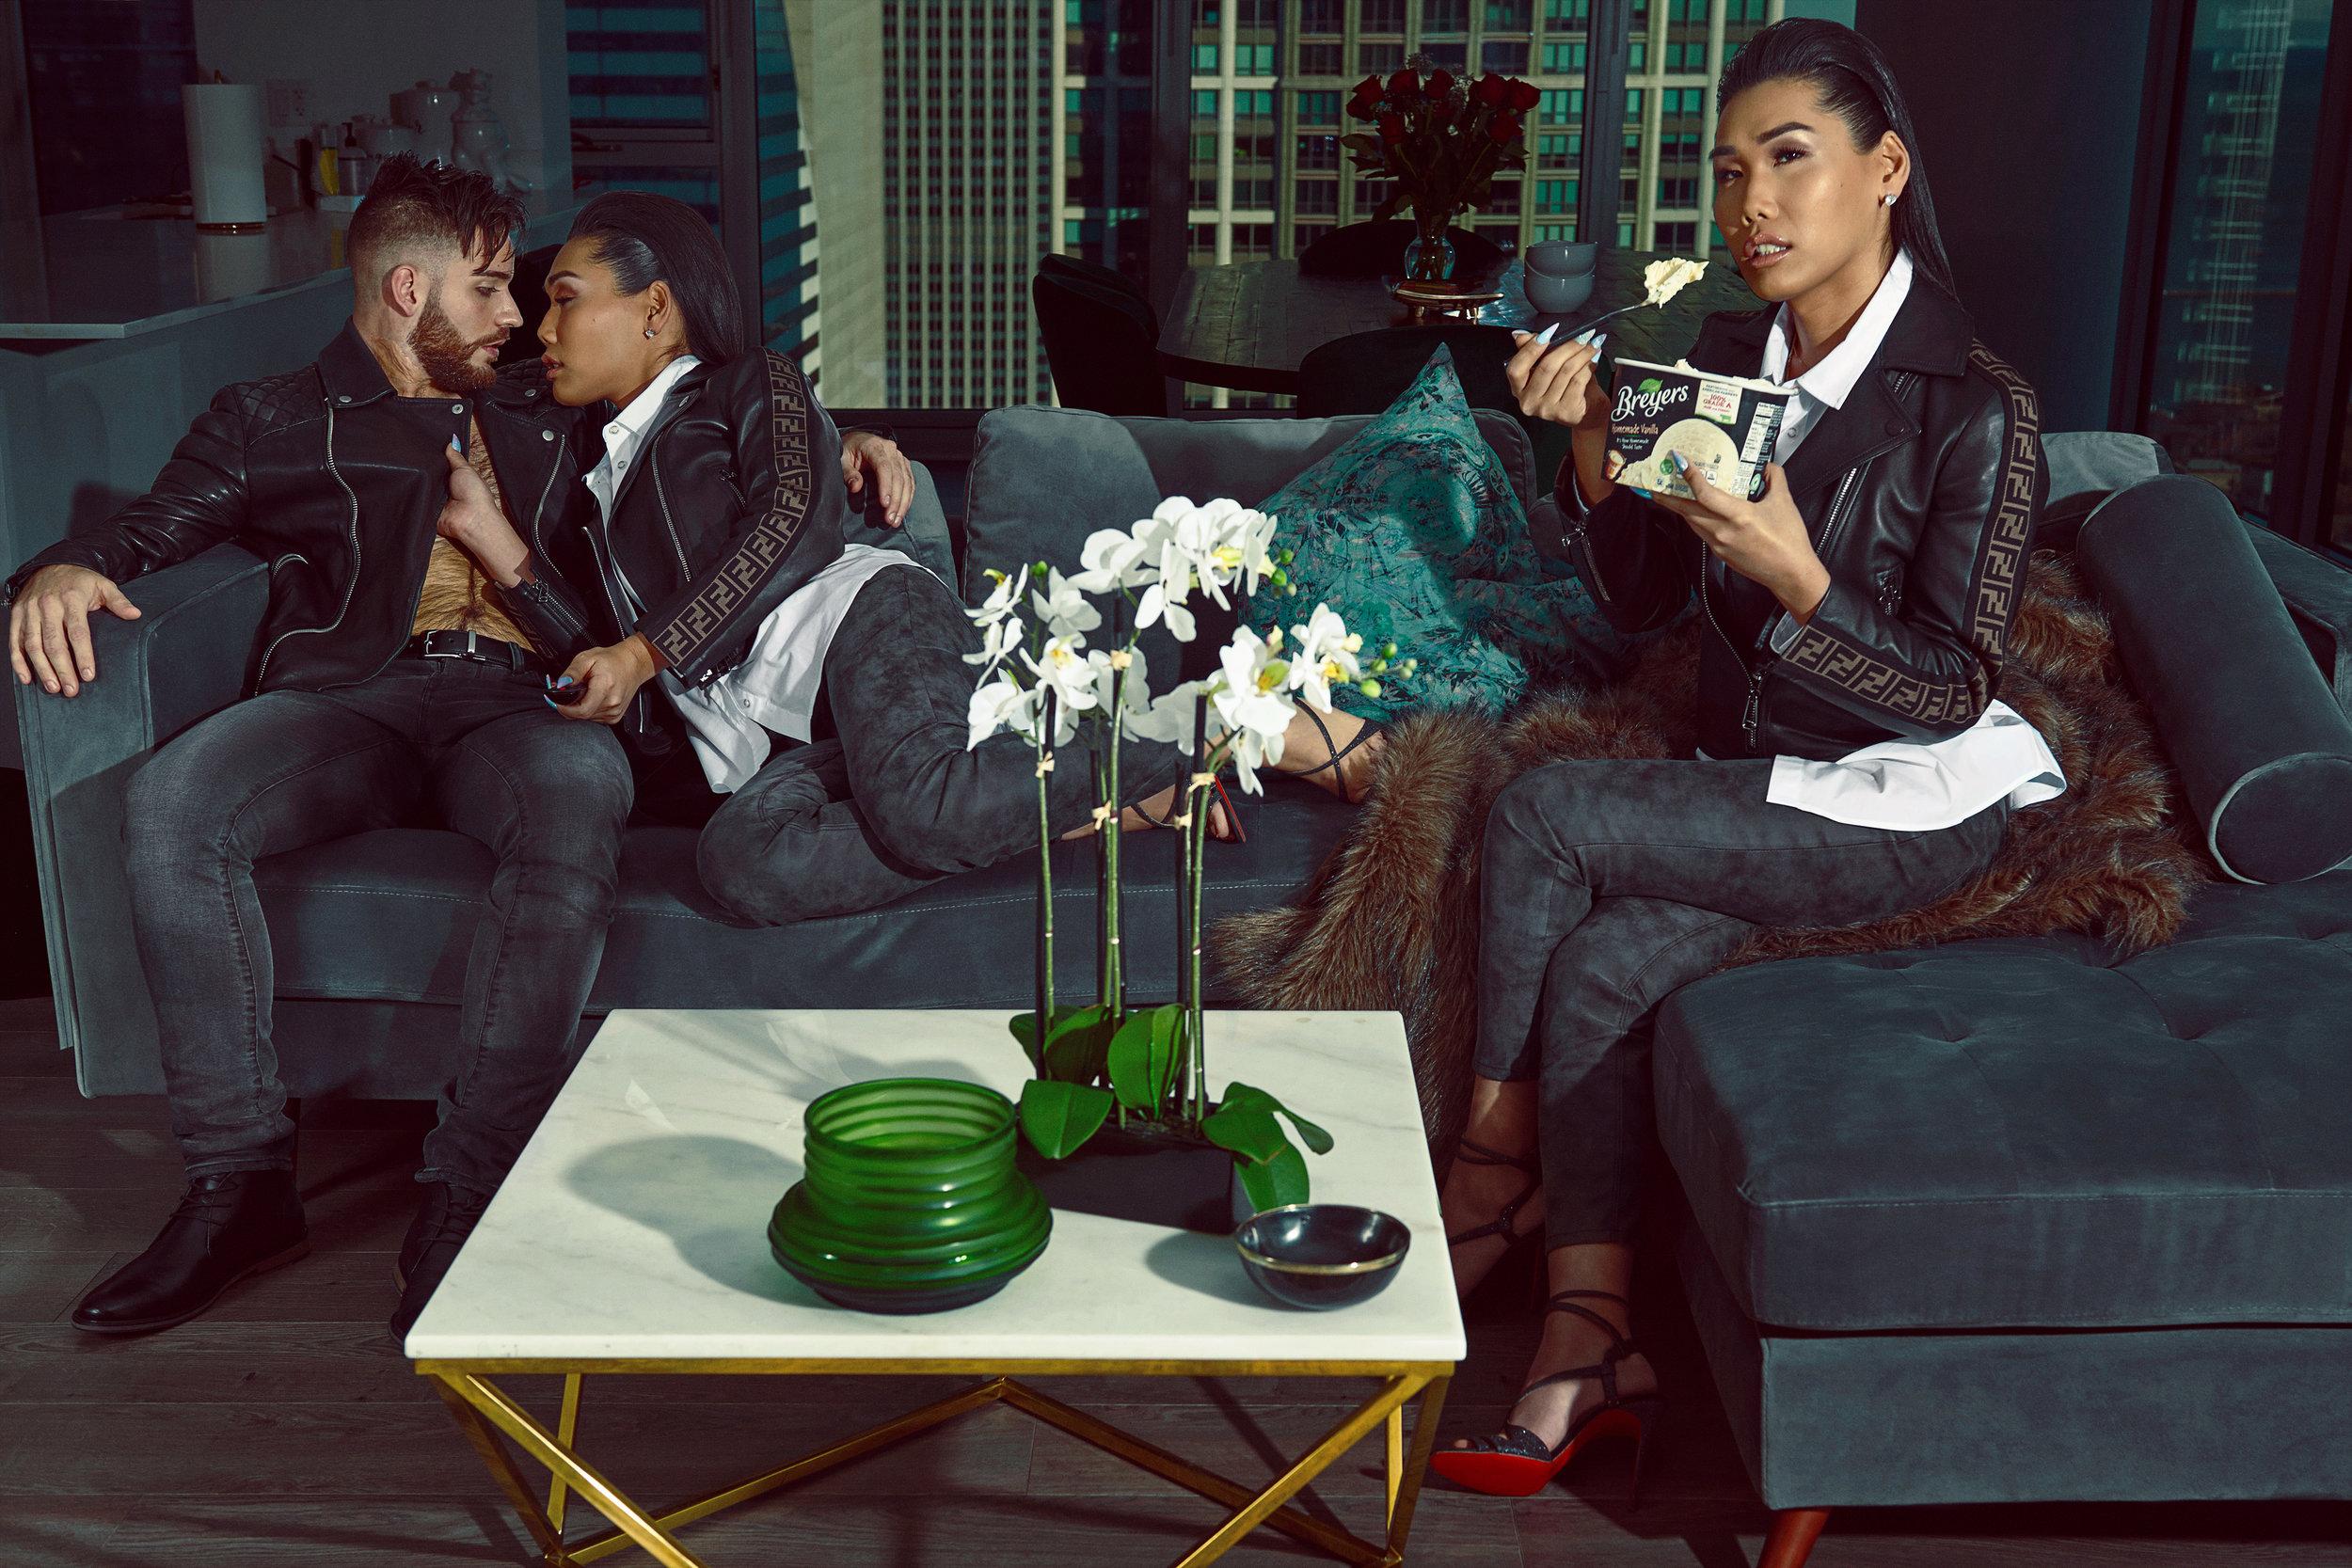 Brandon—Jacket: TopMan, Jeans: John Varvatos, Shoes: Calvin Klein  Gia—Jacket: Fendi, Shirt: Tommy Hilfiger, Pants: Express, Shoes: Christian Louboutin